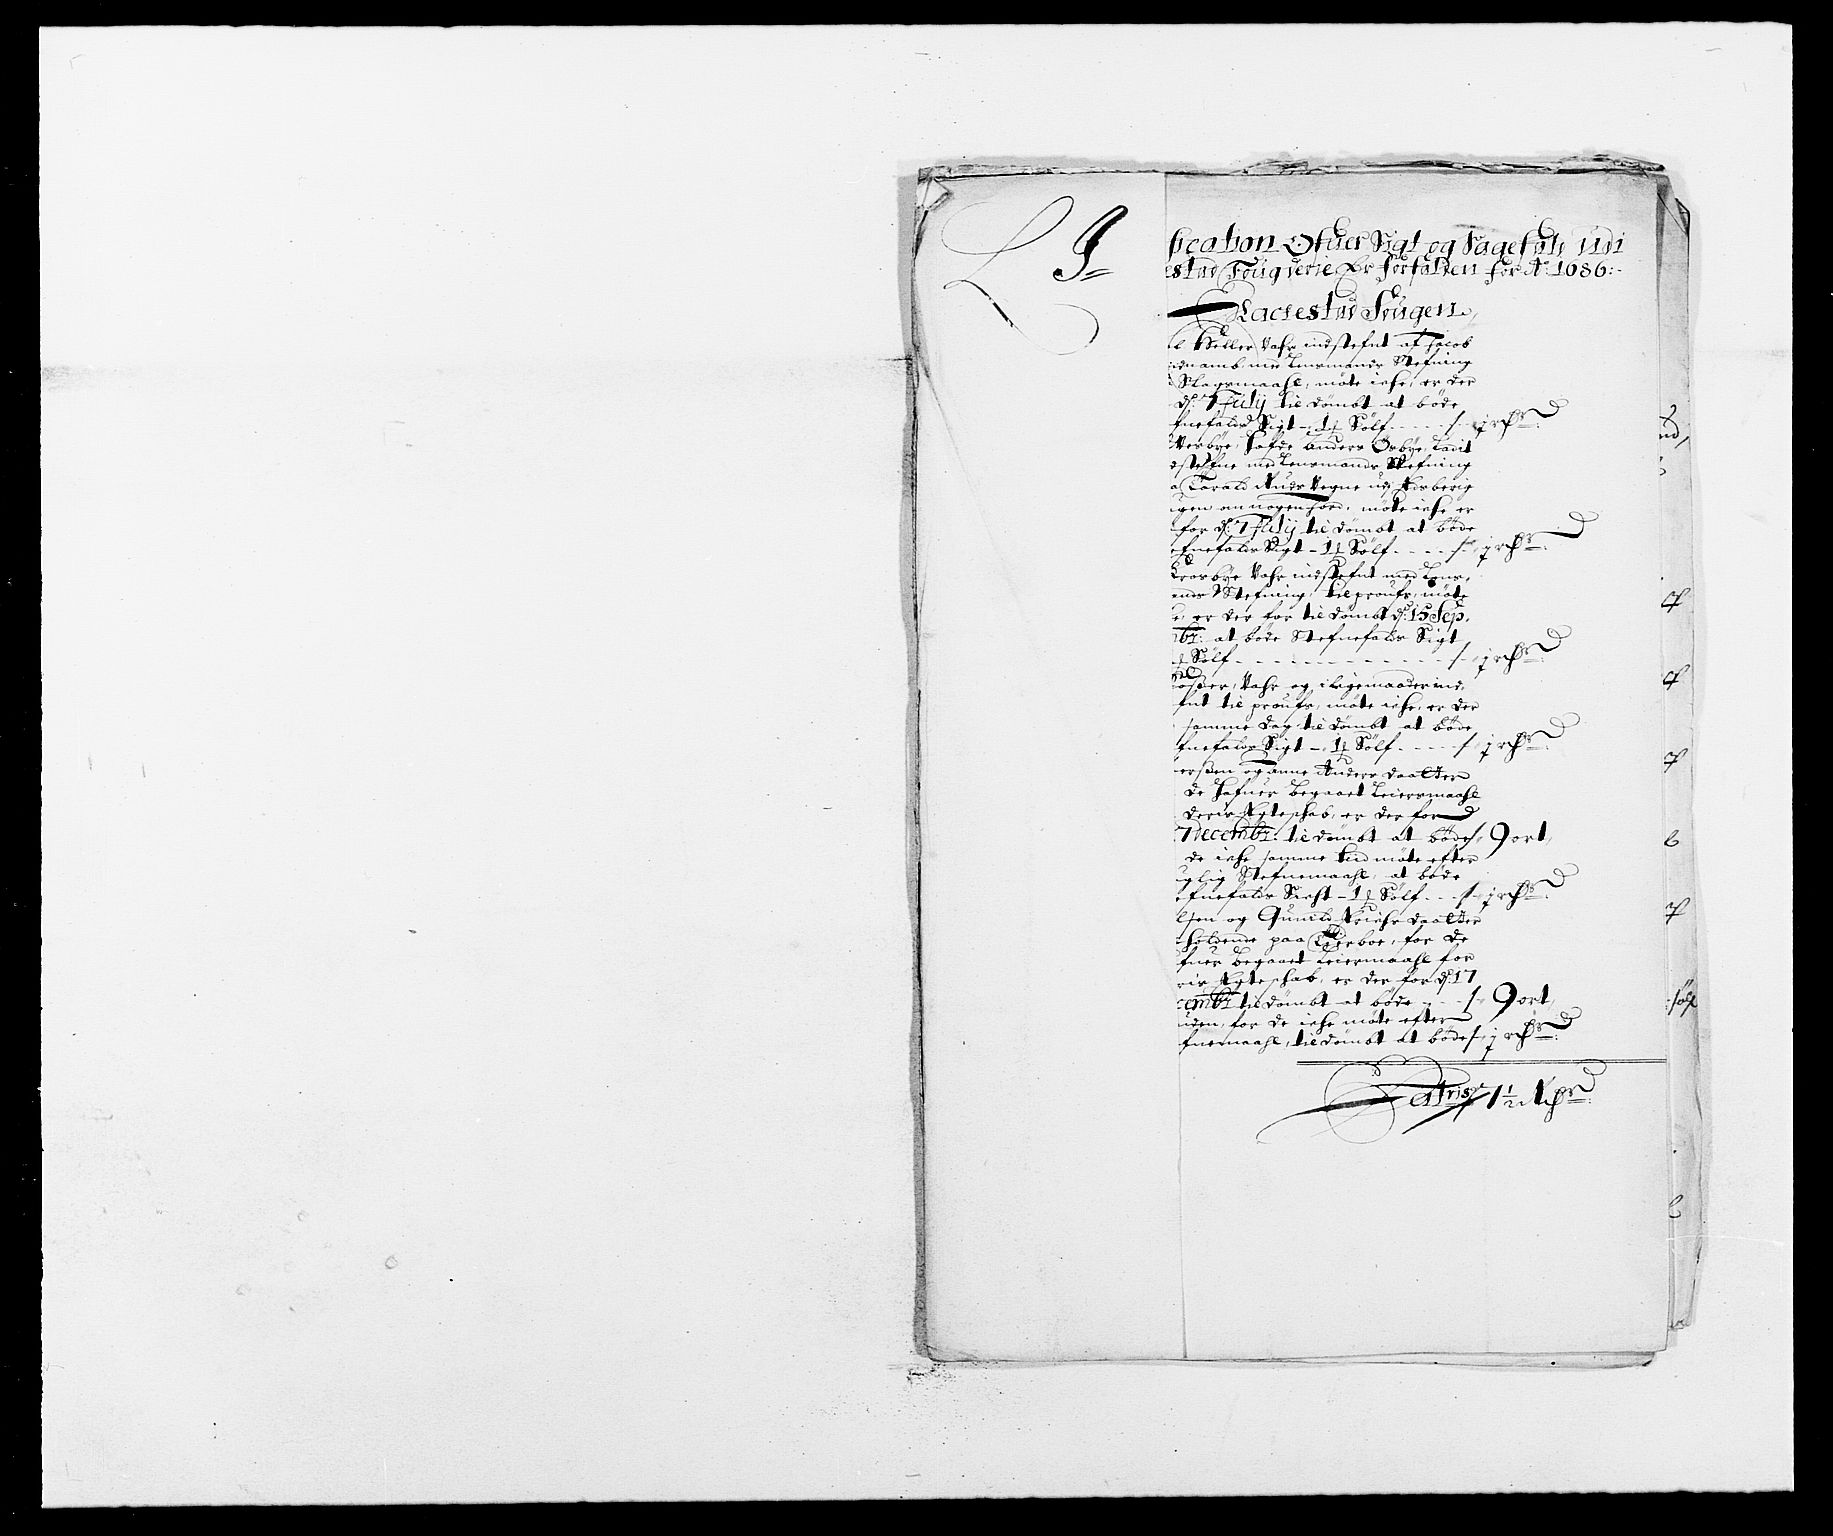 RA, Rentekammeret inntil 1814, Reviderte regnskaper, Fogderegnskap, R05/L0275: Fogderegnskap Rakkestad, 1685-1686, s. 182